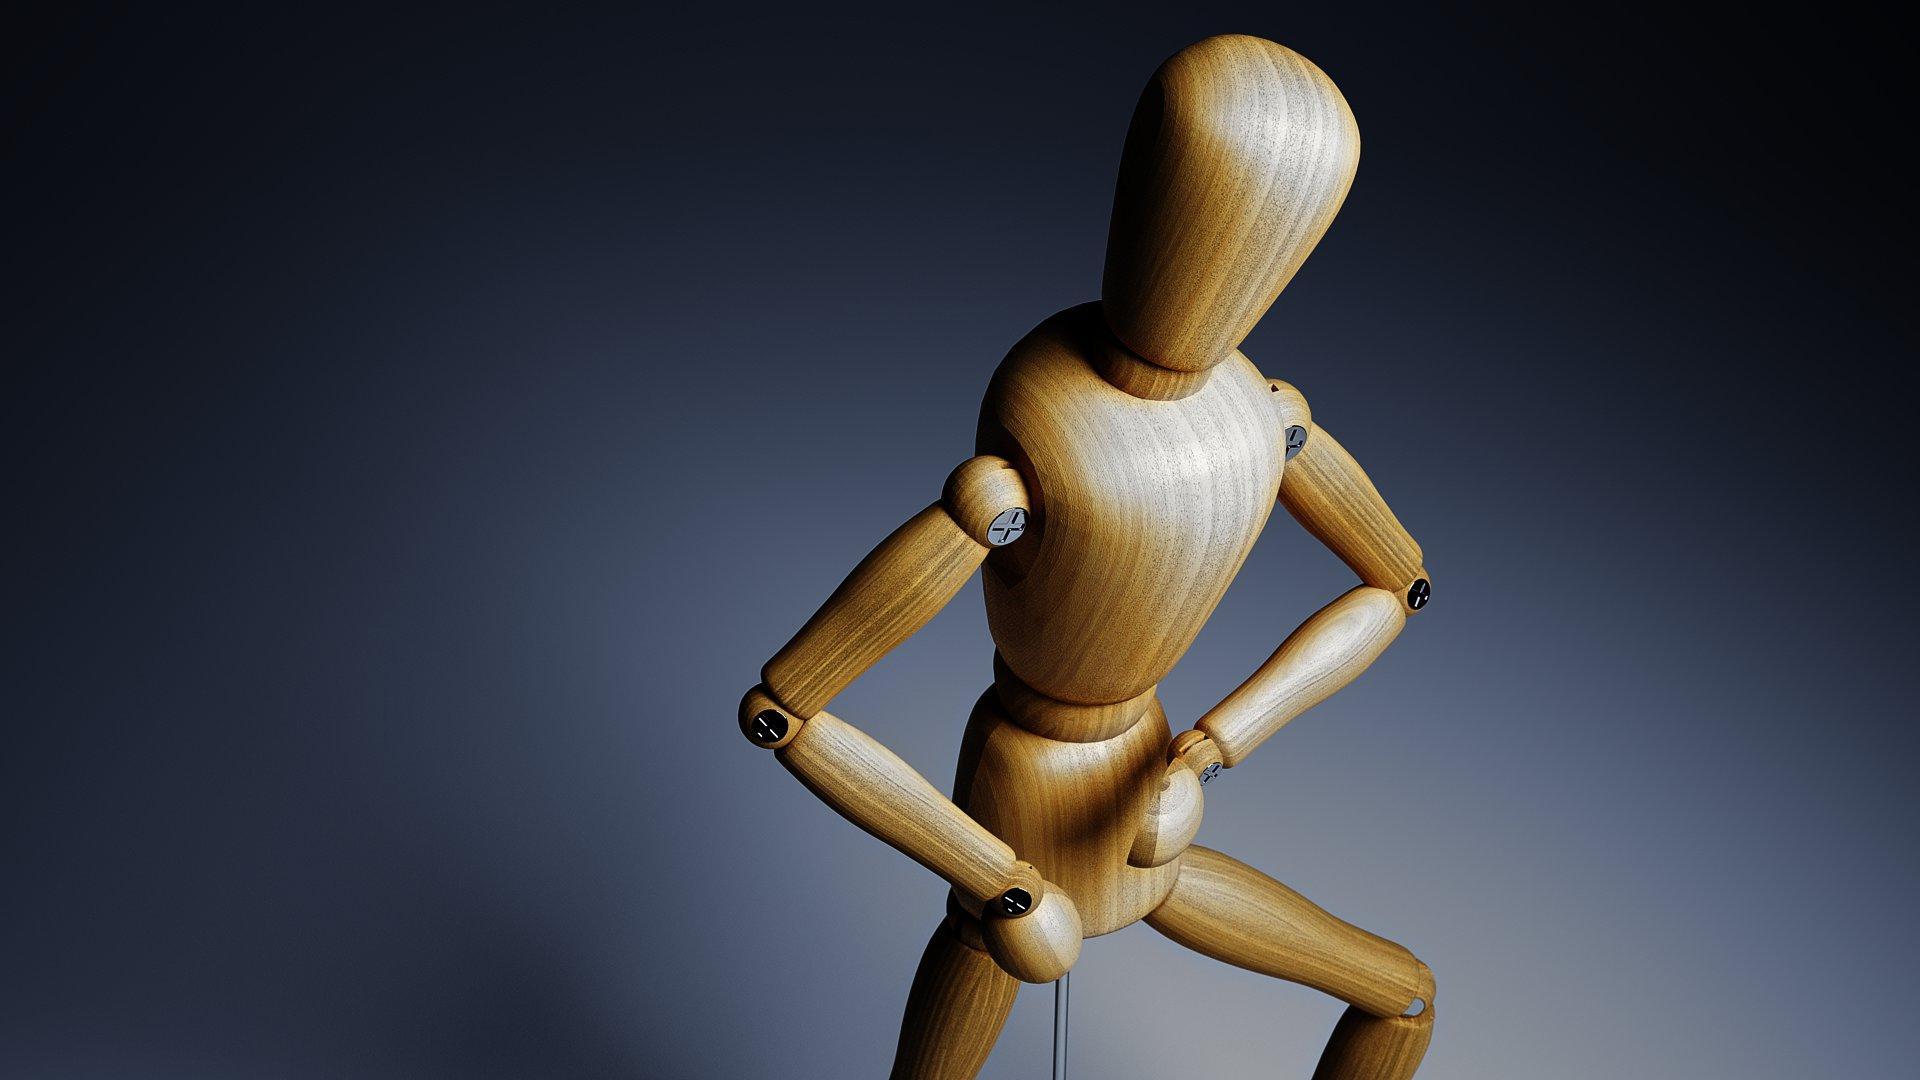 Wooden_Mannequin_1_(ekta320tcd_d65_postpro)